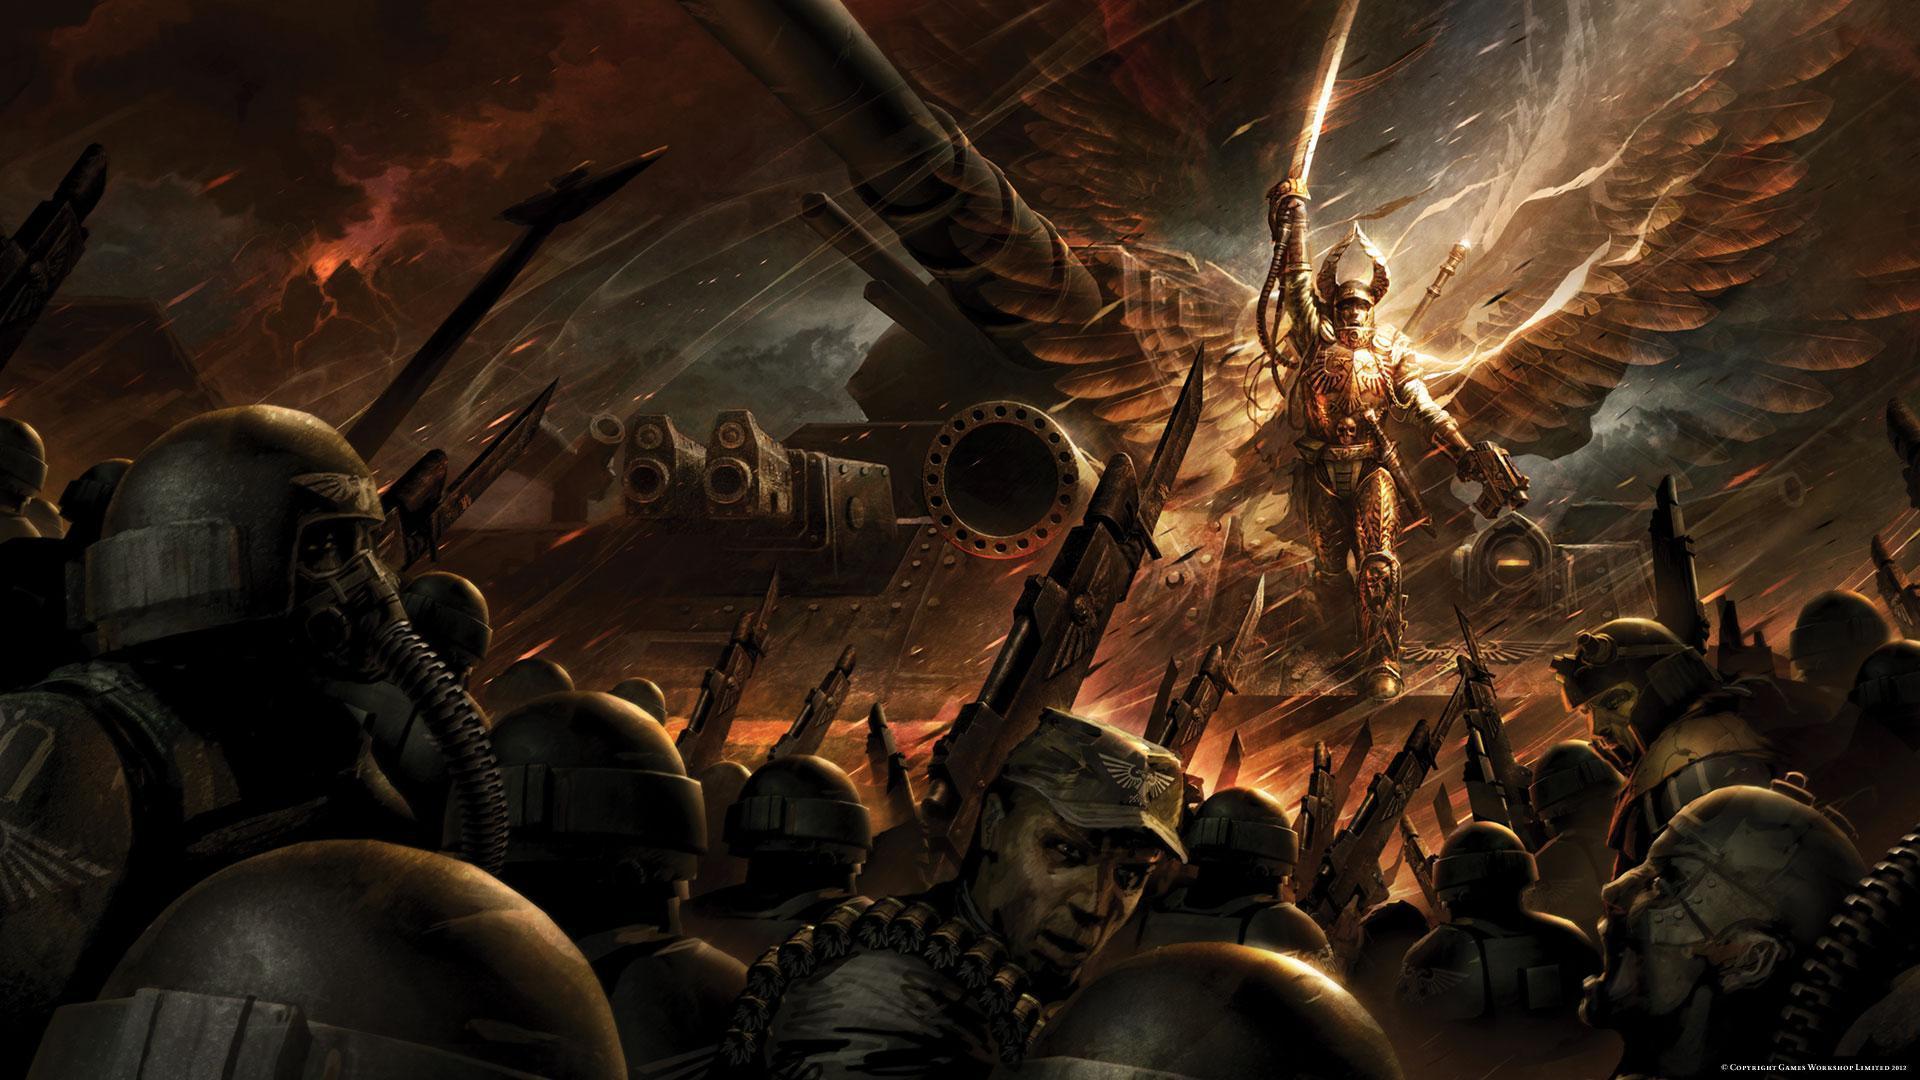 warhammer 40k wallpapers - album on imgur